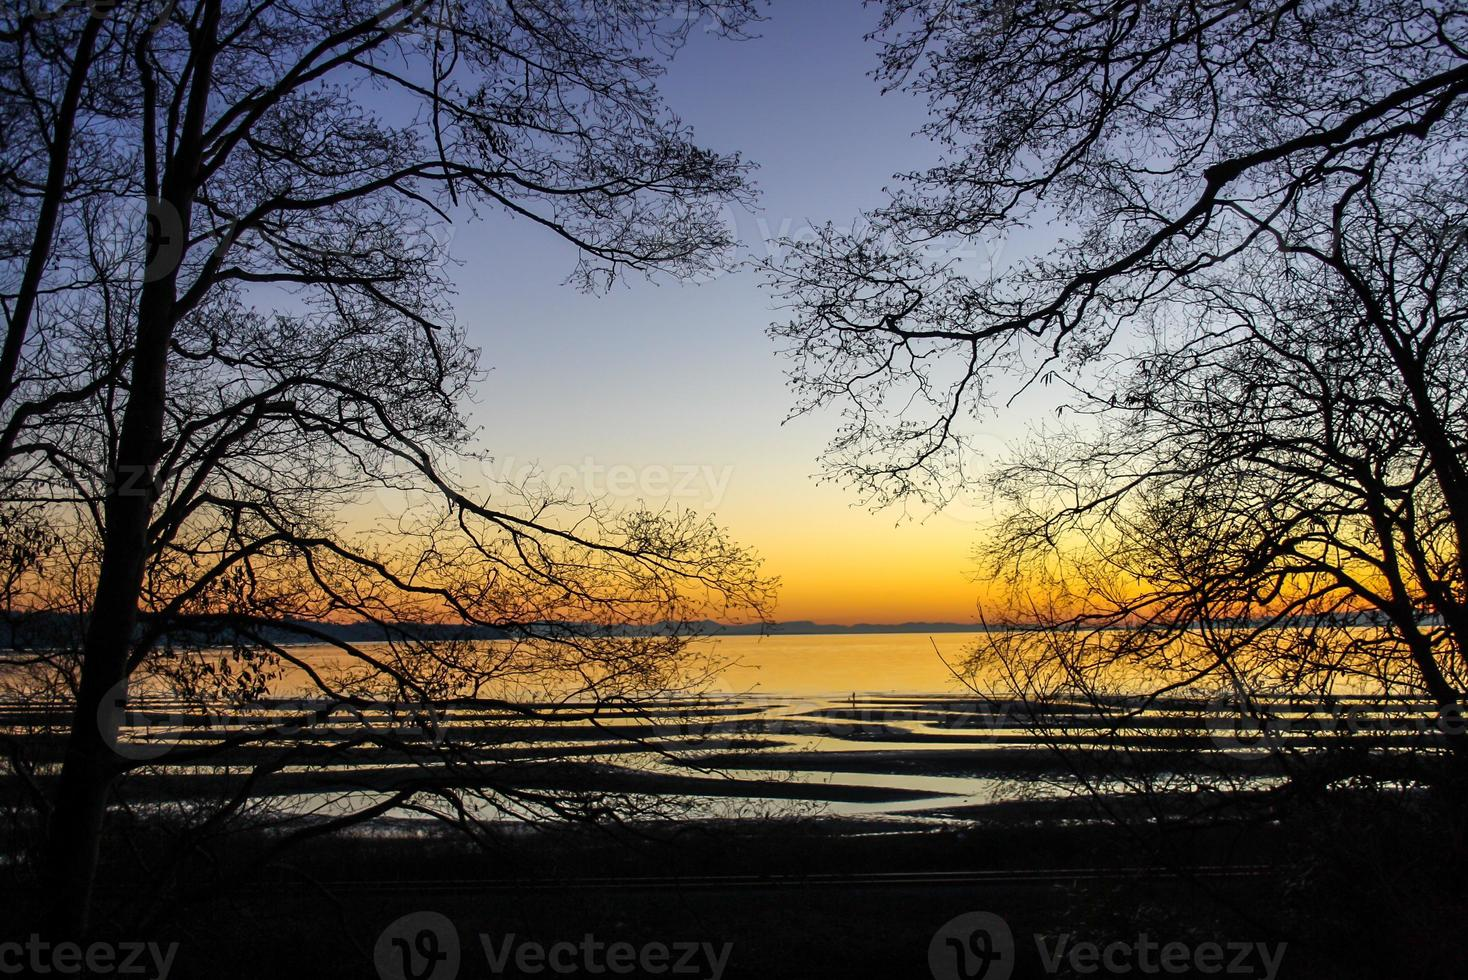 Trees framing the beach photo